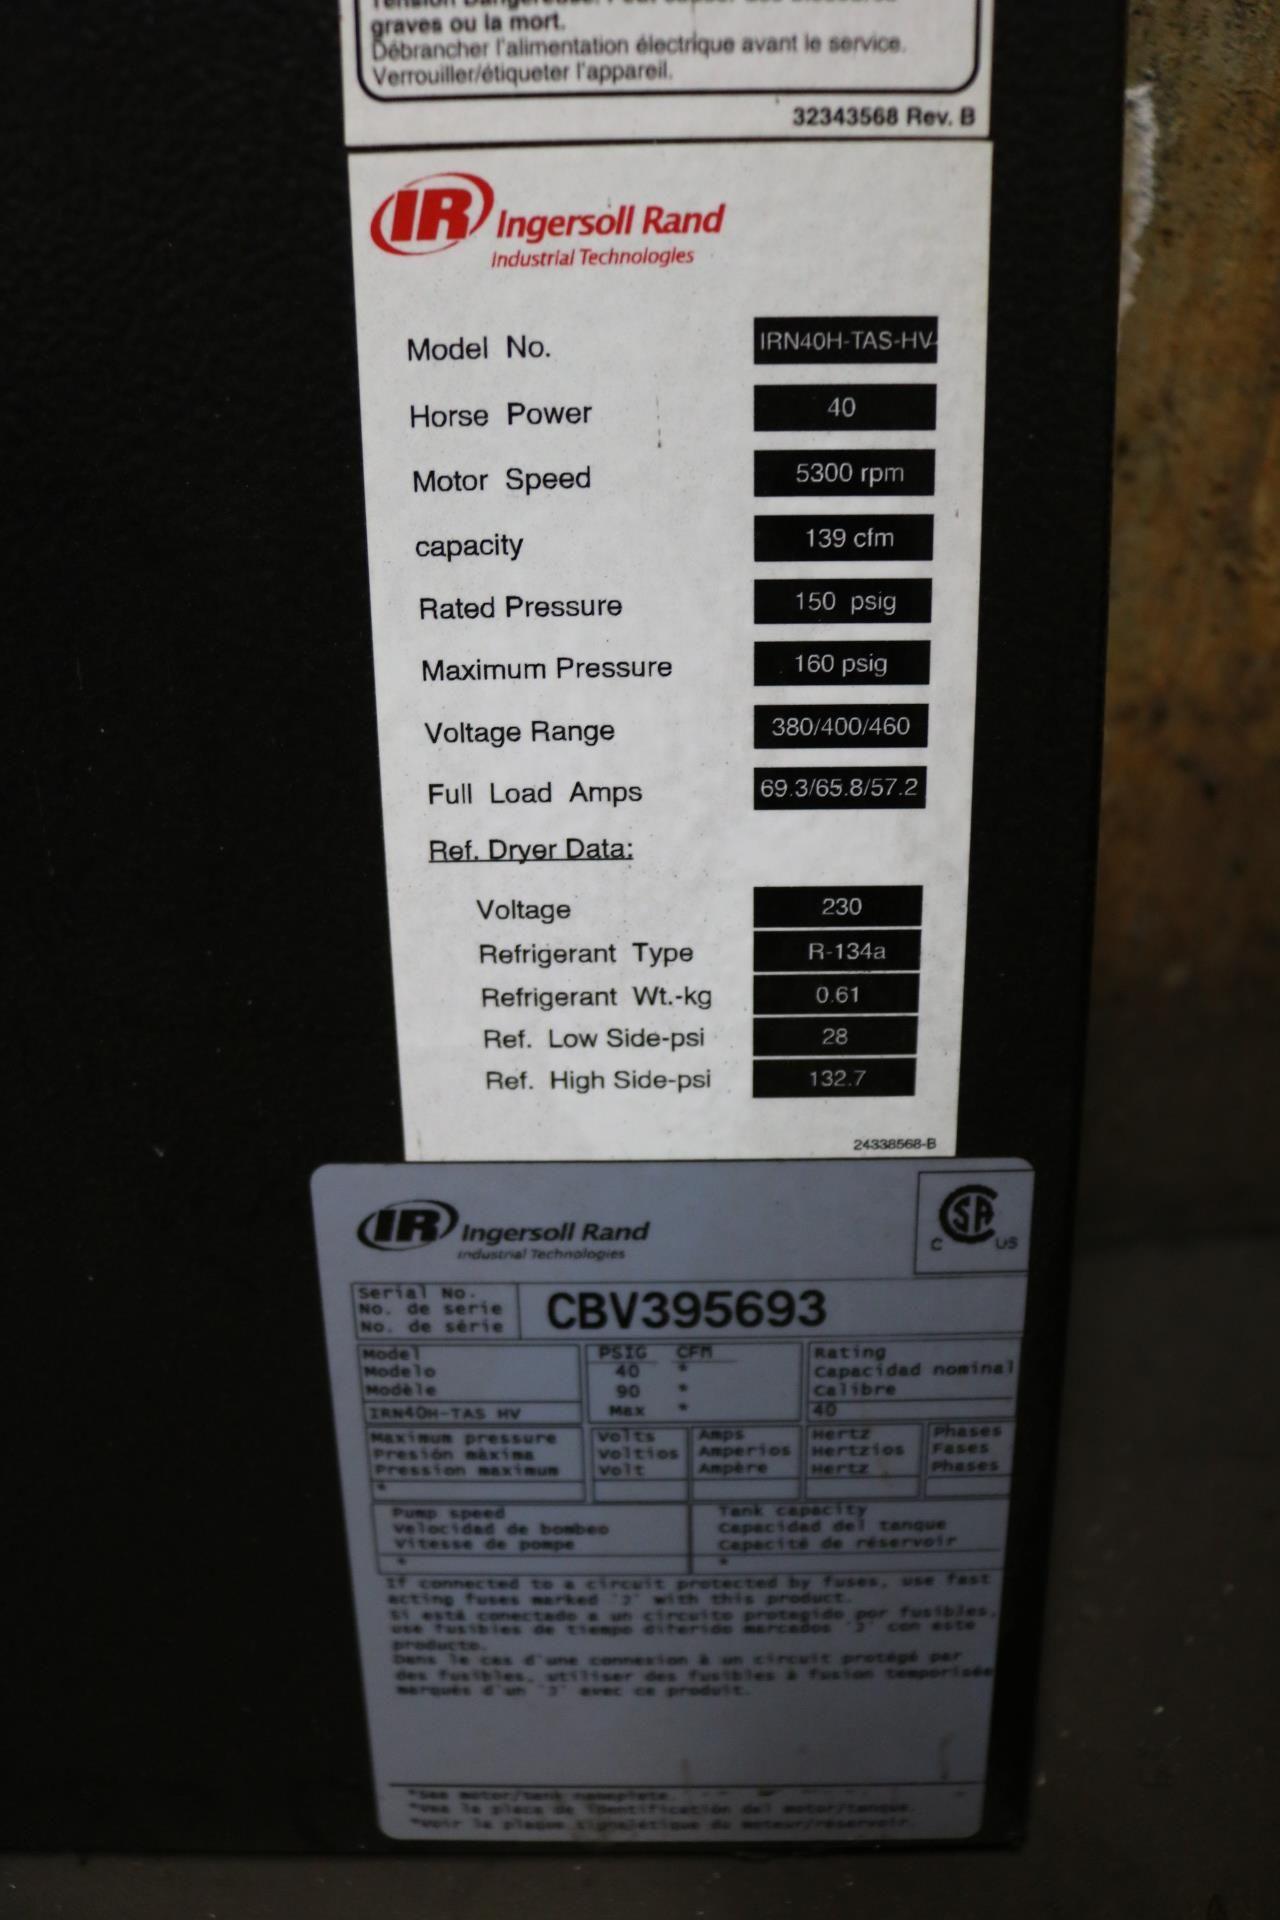 Lot 10 - 2015 INGERSOLL RAND MODEL IRN40H-TAS, 40 HP, 150 PSIG, S/N CBV395693